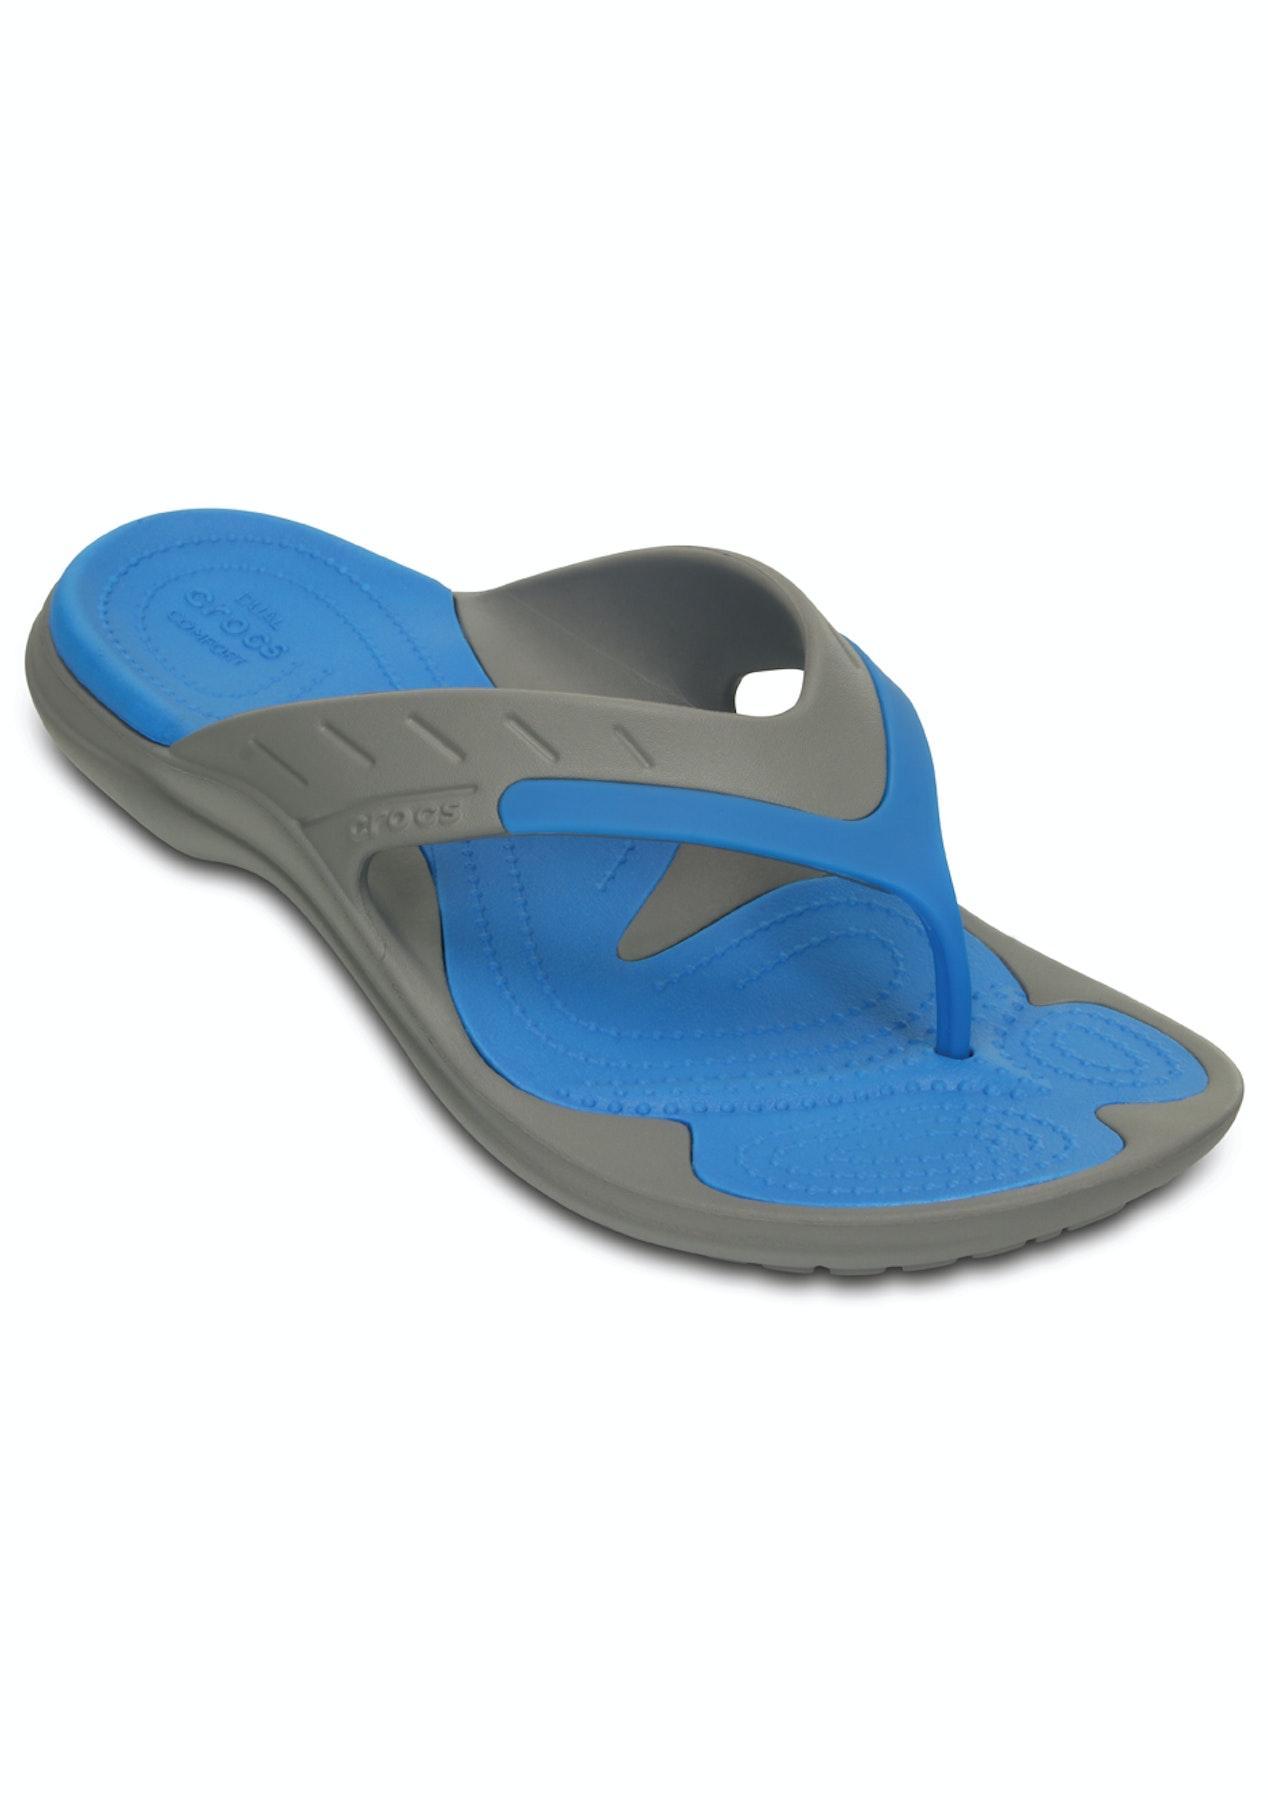 78132e997e71 CROCS - Modi Sport Flip - Smoke Ocean - Crocs - Onceit